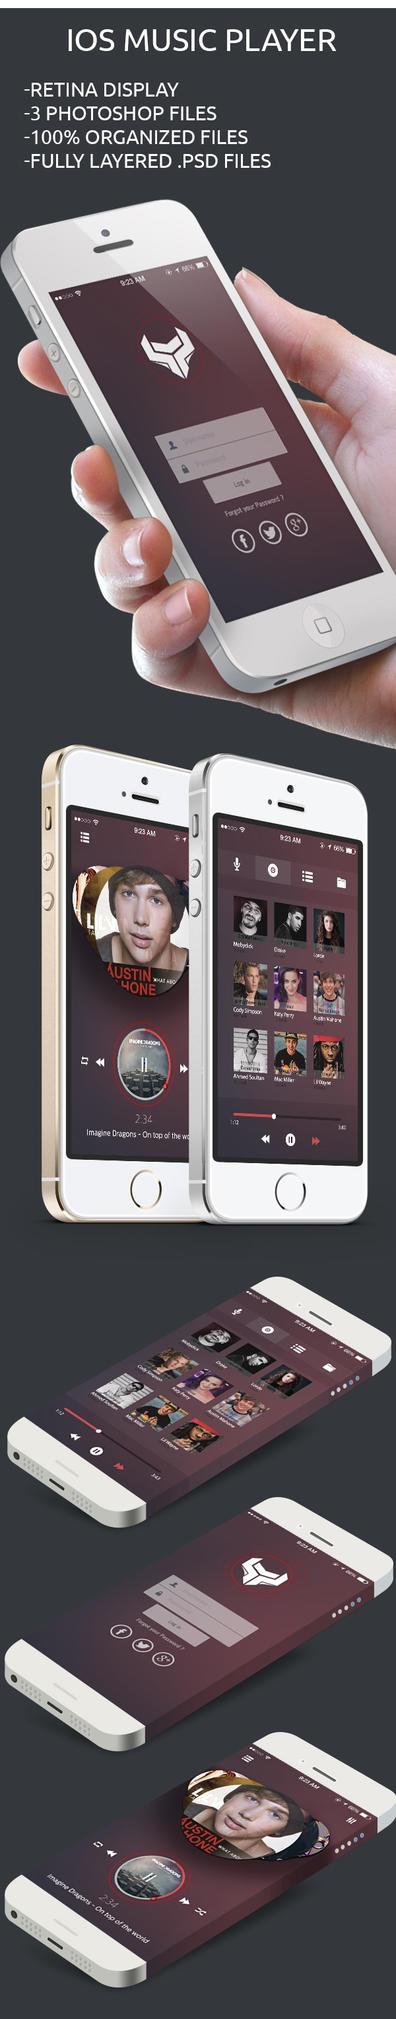 Music app Free UI psd file by kadayoub